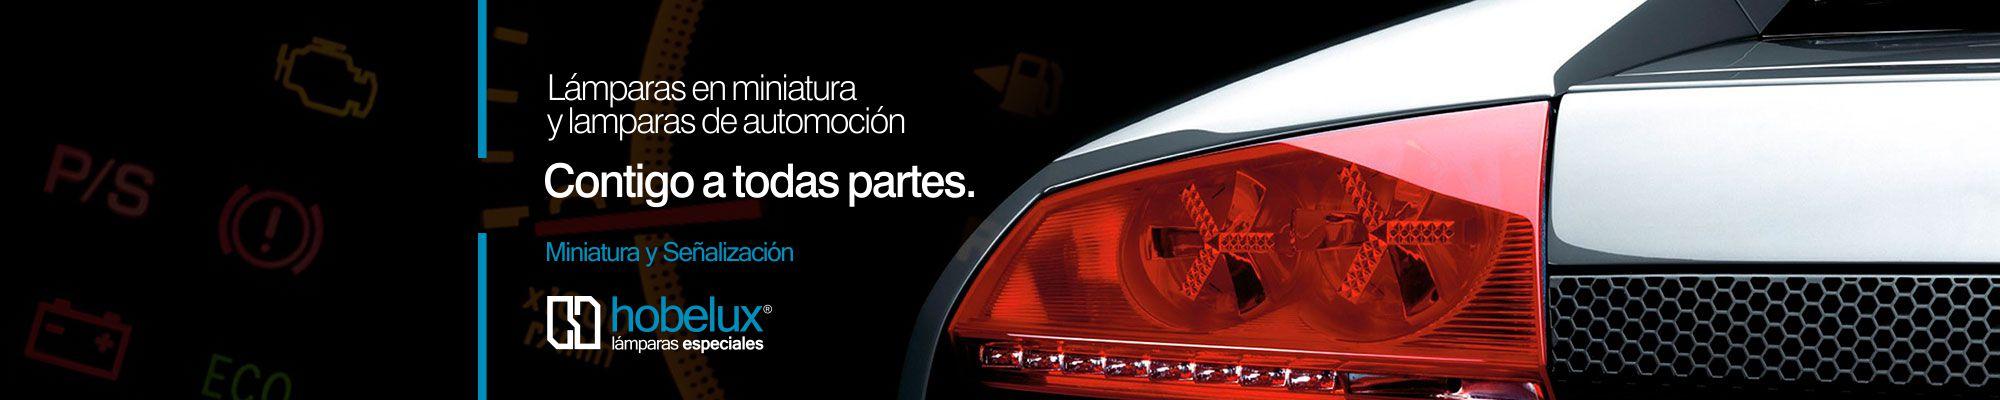 SLD3_iluminacion_automocion